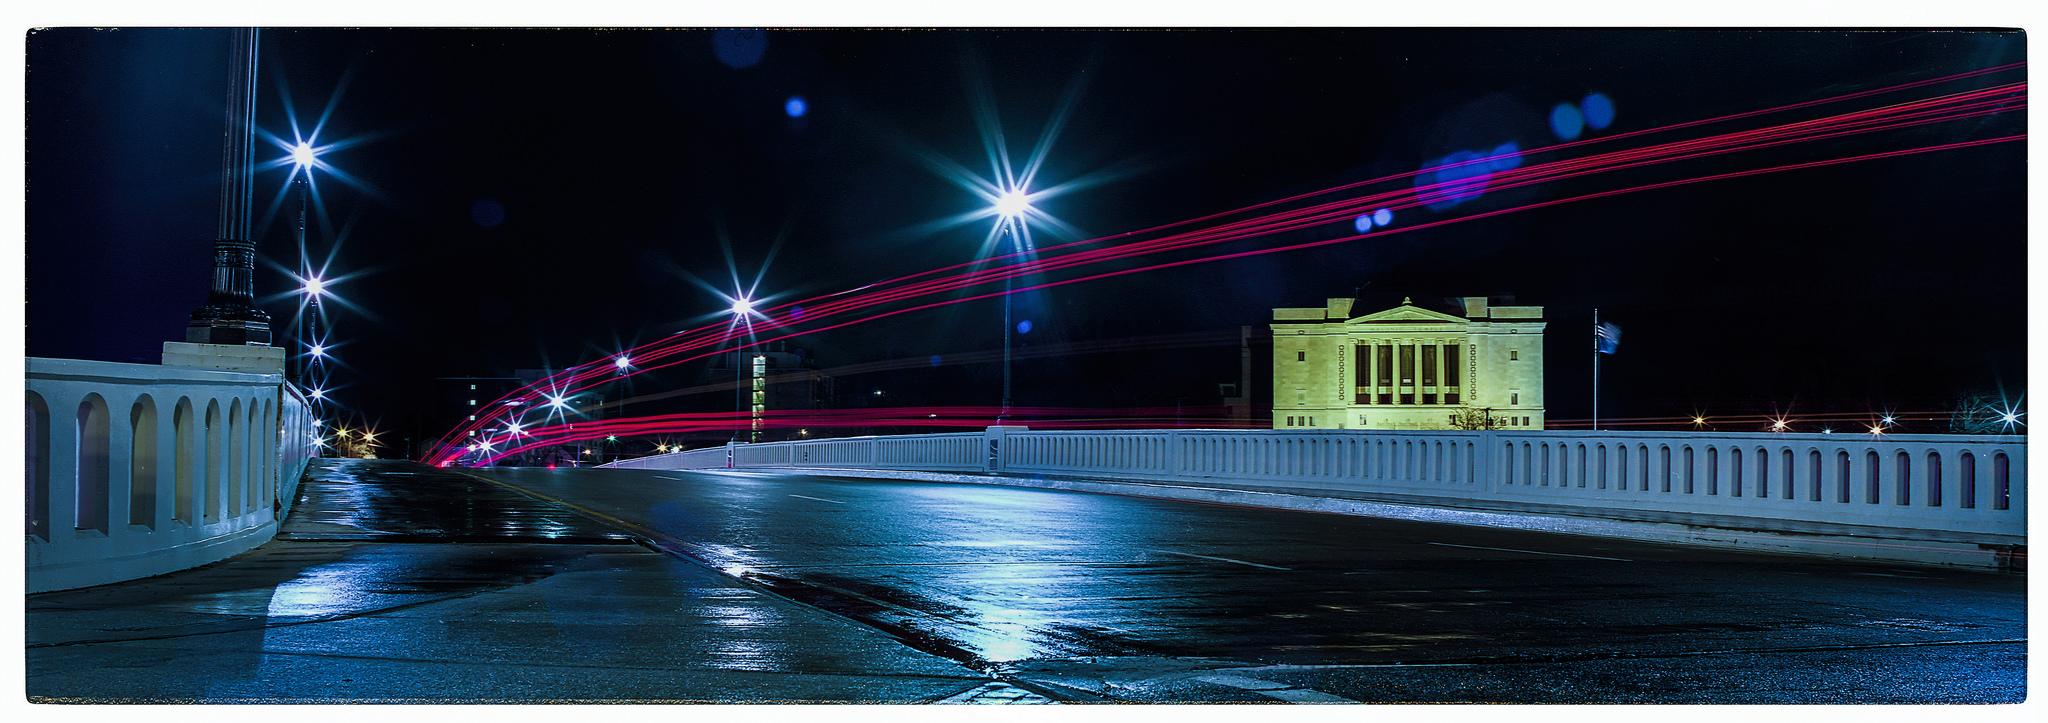 Monument Avenue Bridge long exposure. Mamiya RB67 ProS on 35mm Ektar film